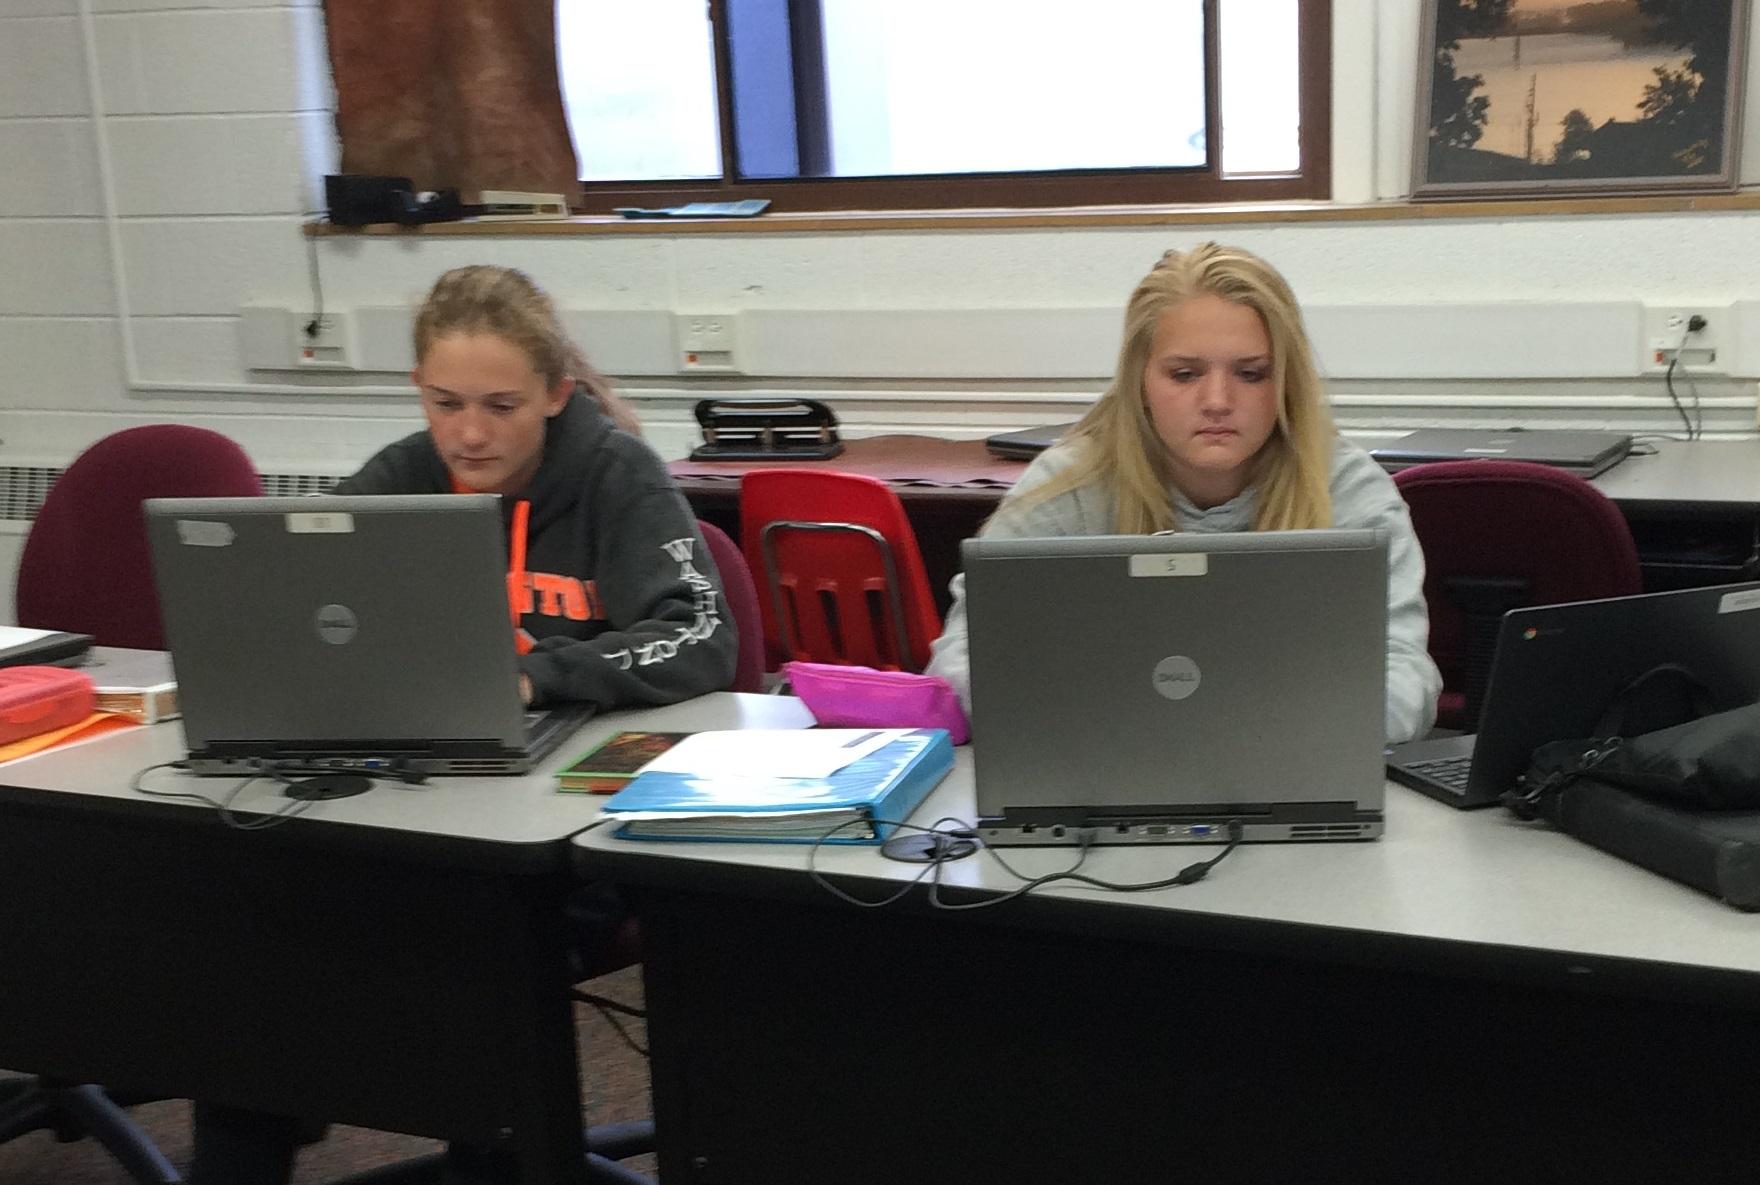 Pekin Community High School students earn certification through the Microsoft IT Academy